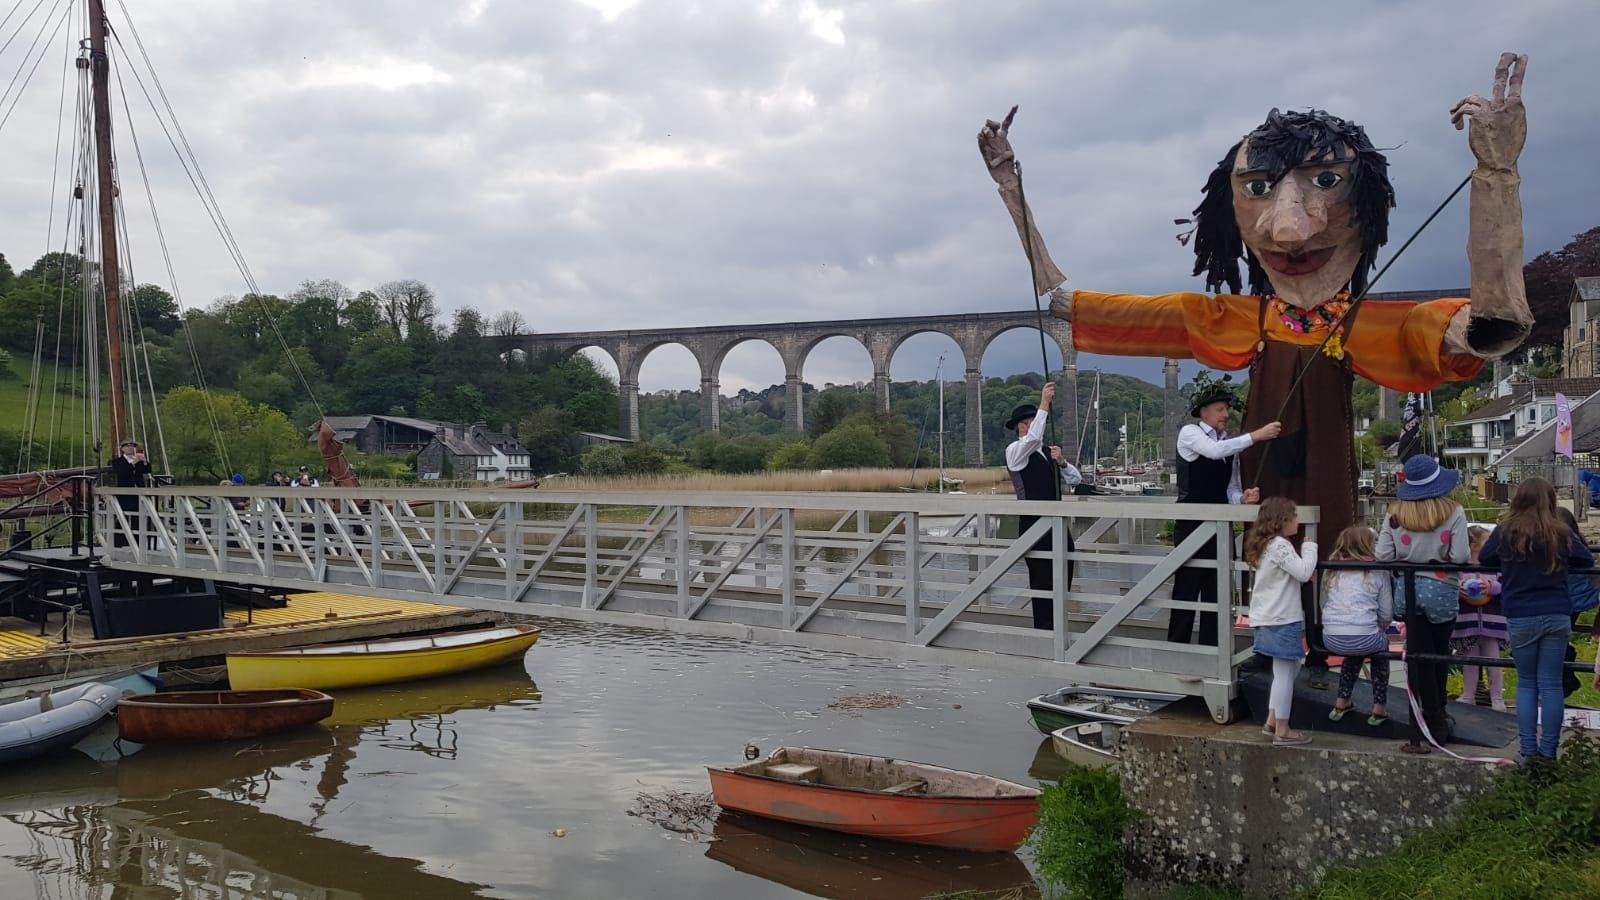 Calstock Viaduct Giant